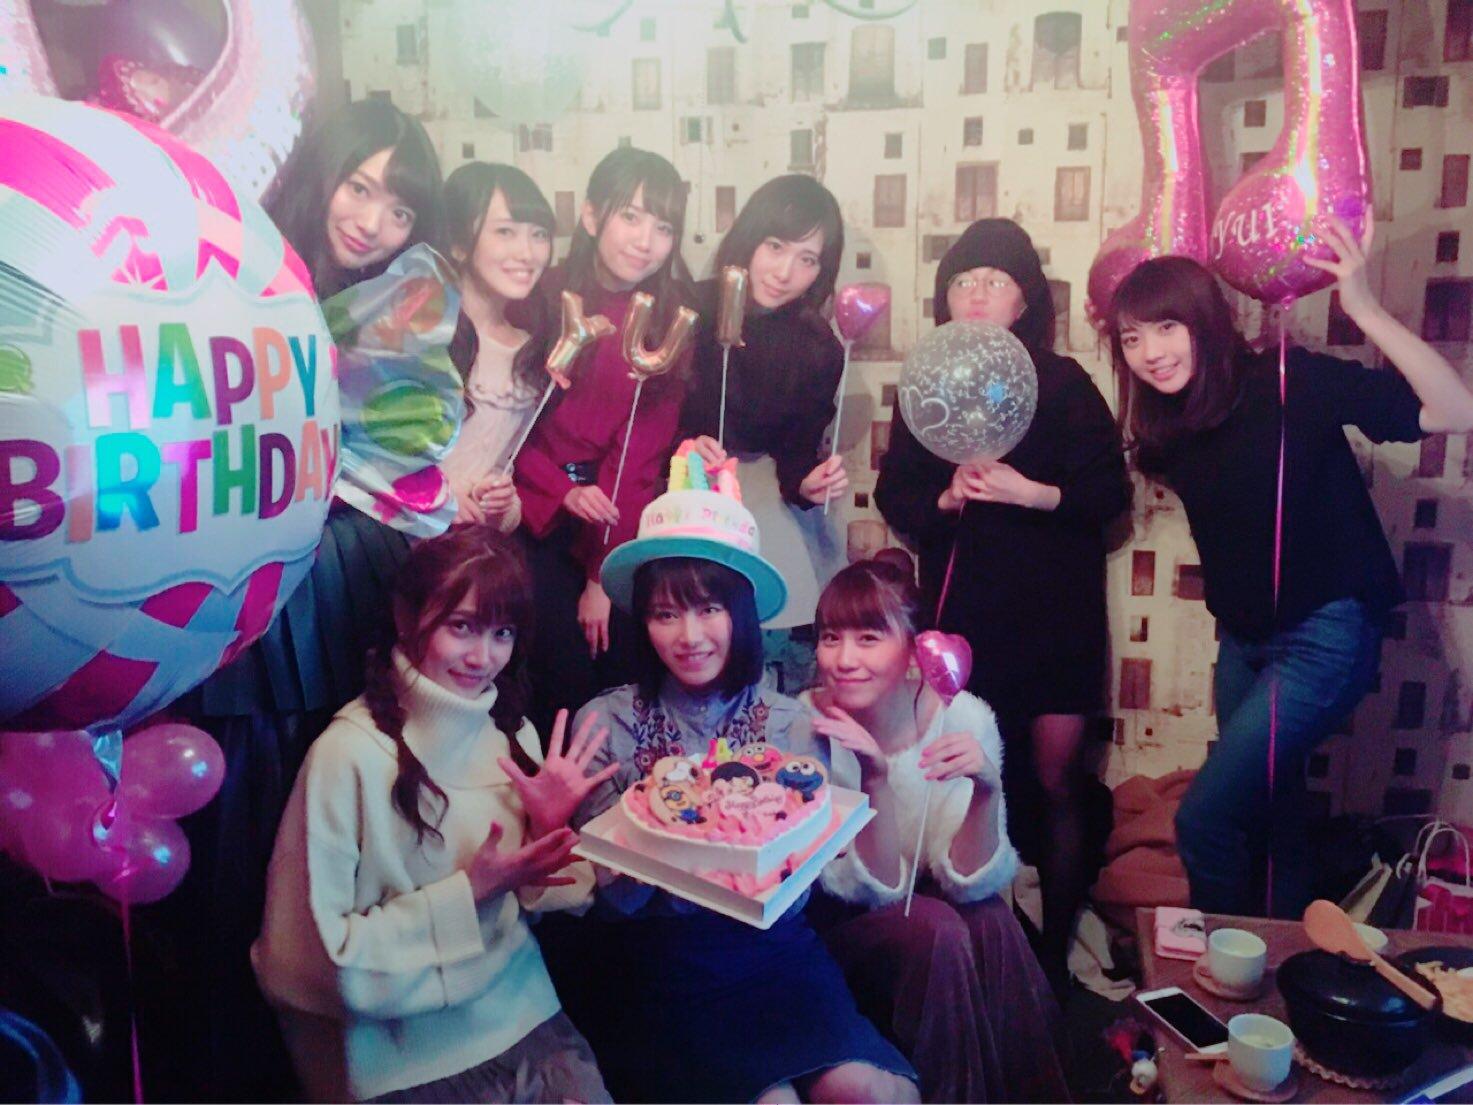 横山由依 誕生日パーティー